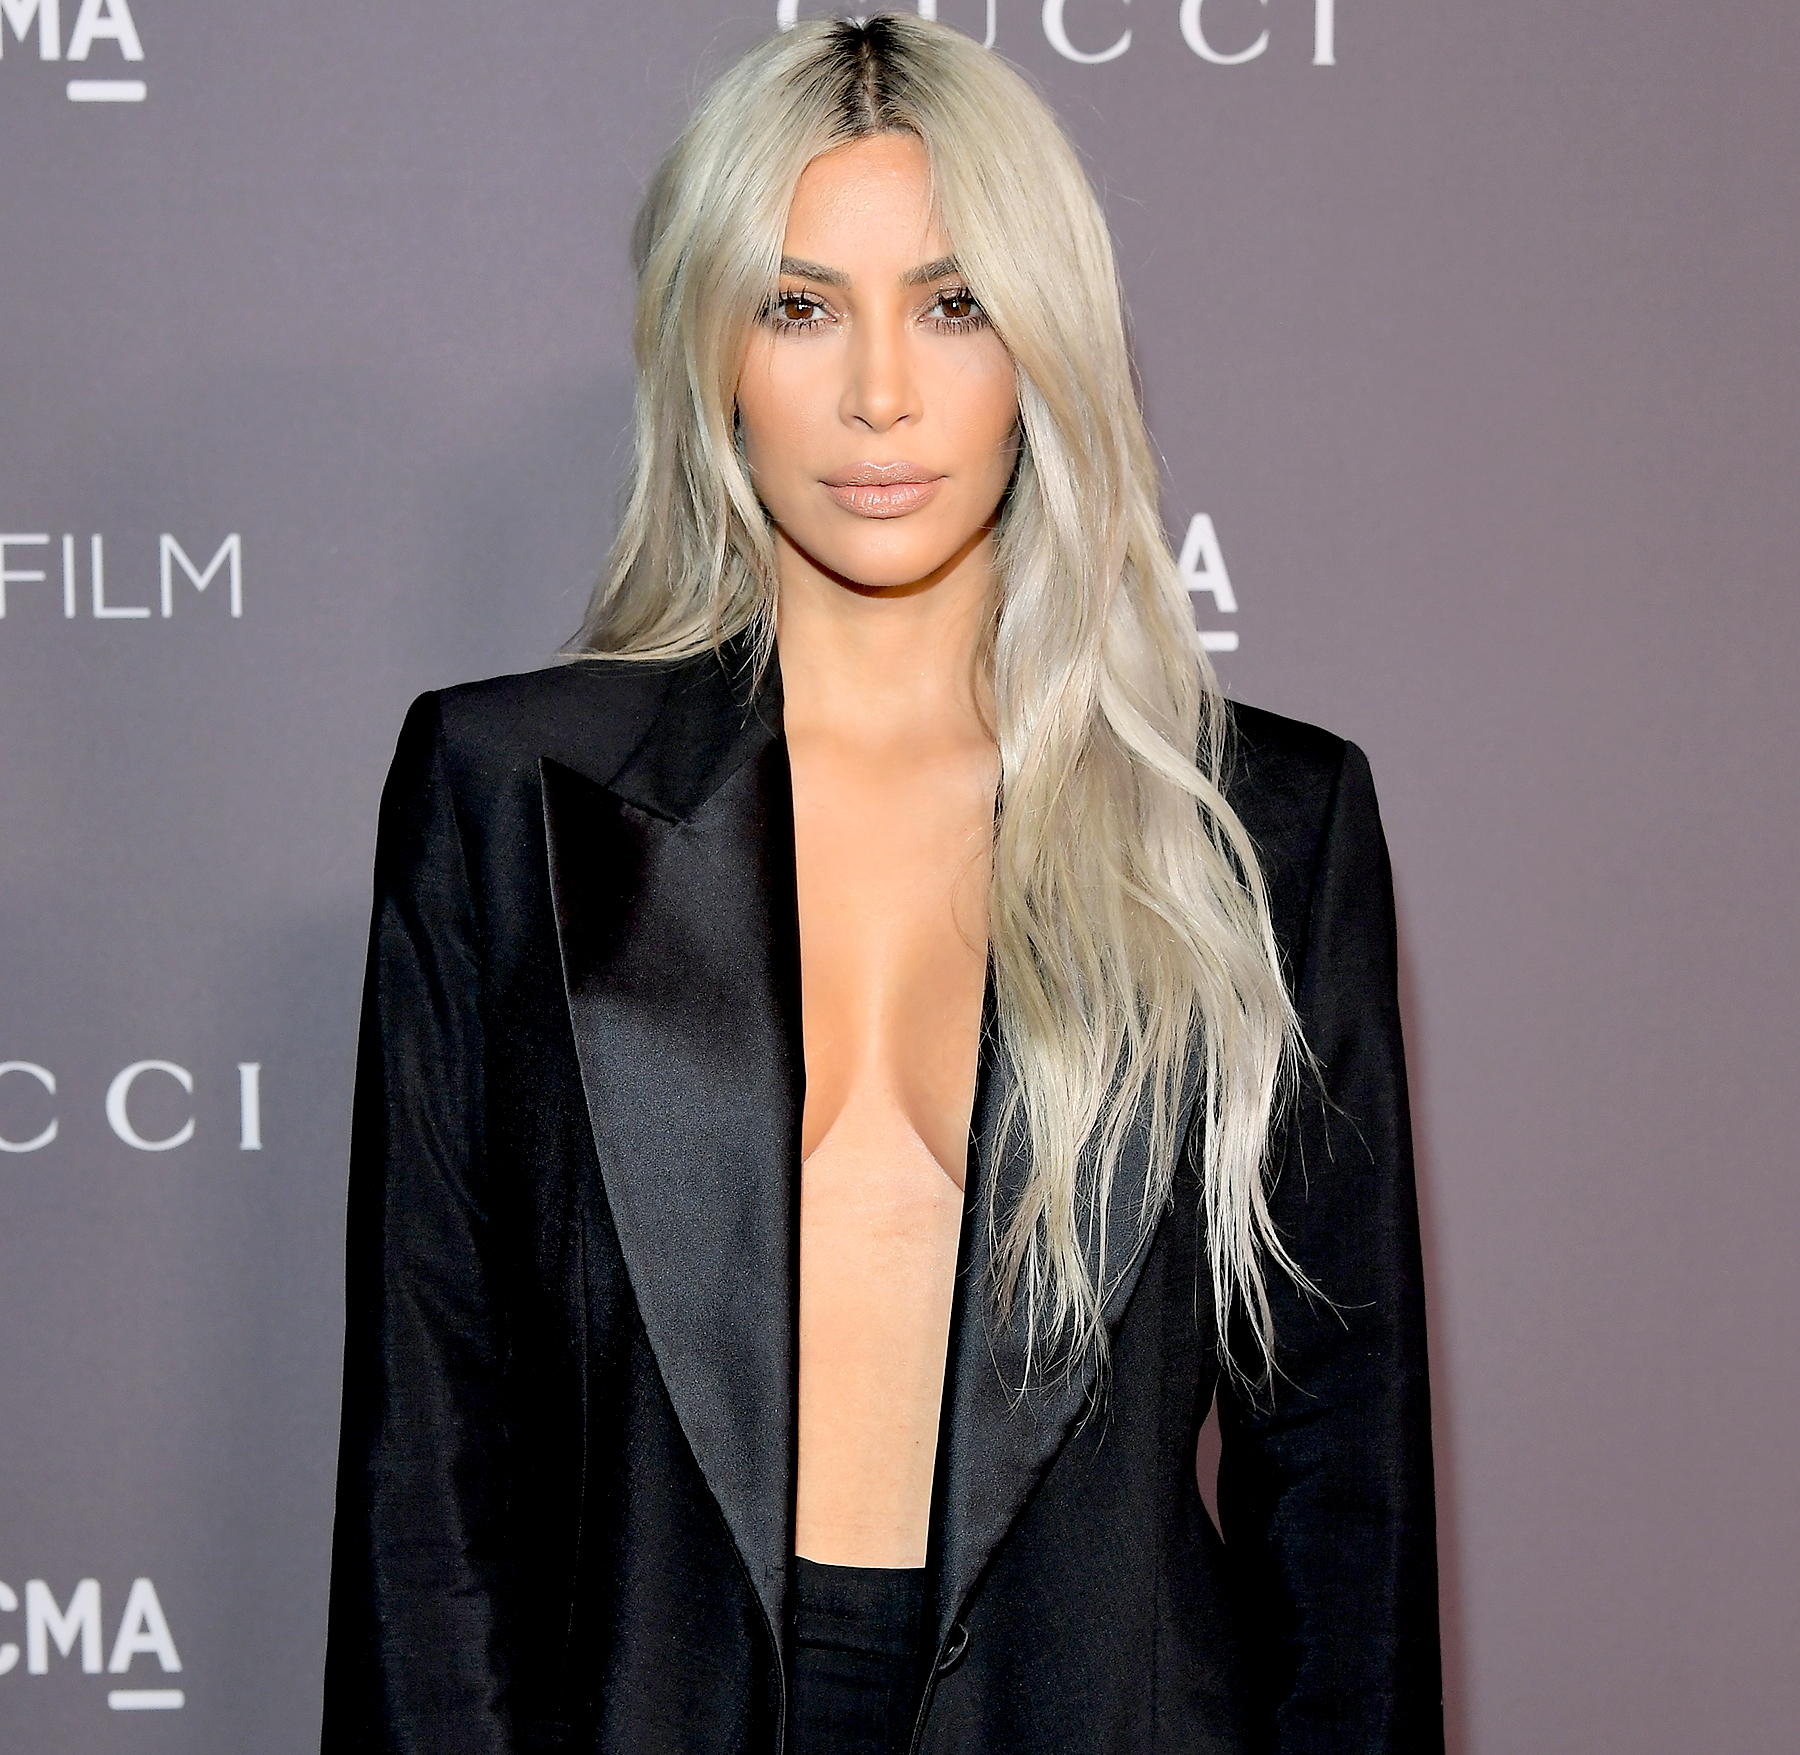 Kanye West & Kim Kardashian's Mansion Is Now Worth $60 Million